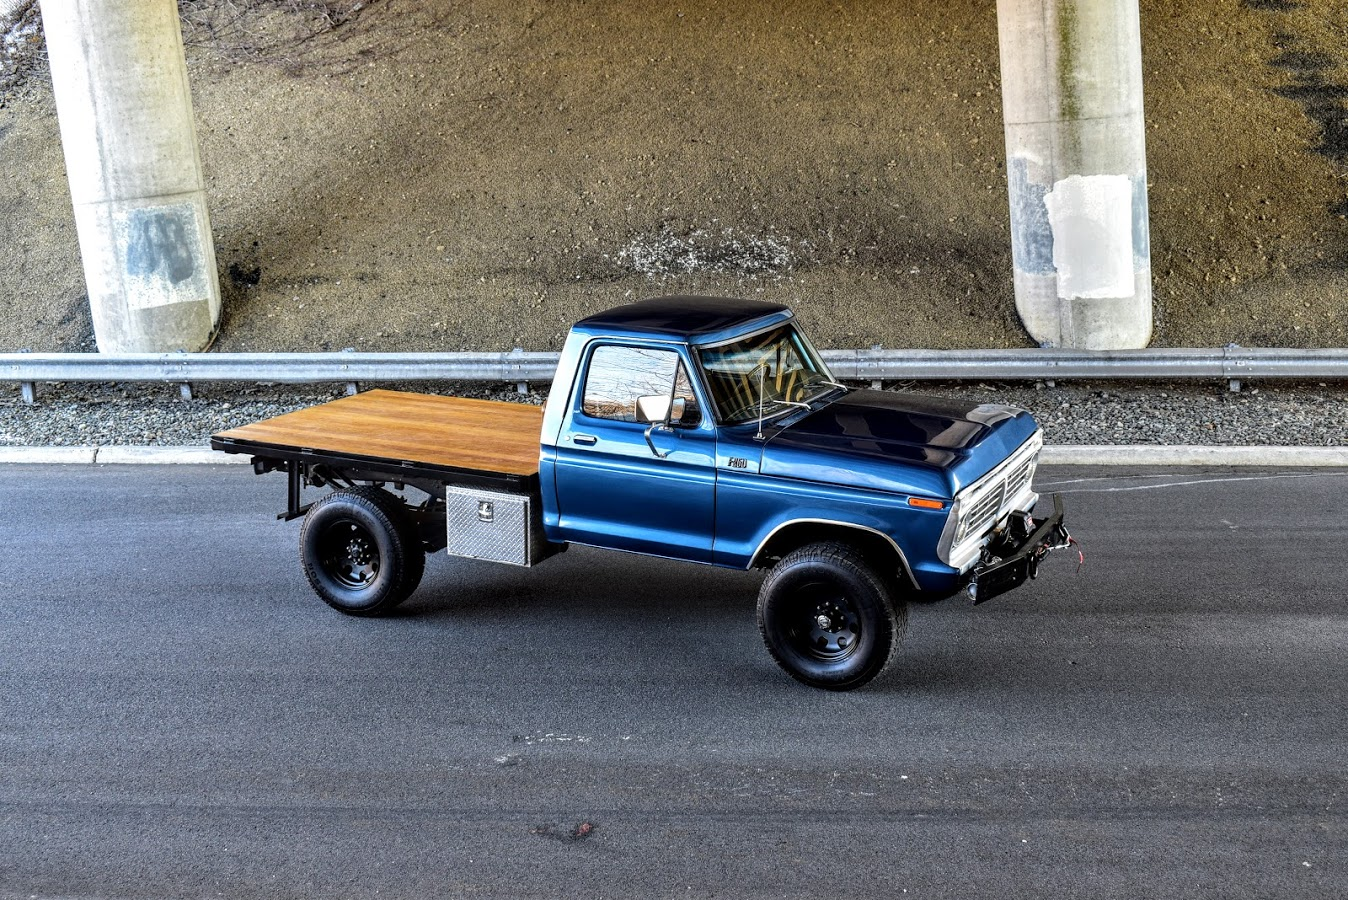 1973 Ford F250 Highboy With Wood Deck Bed 14.JPG